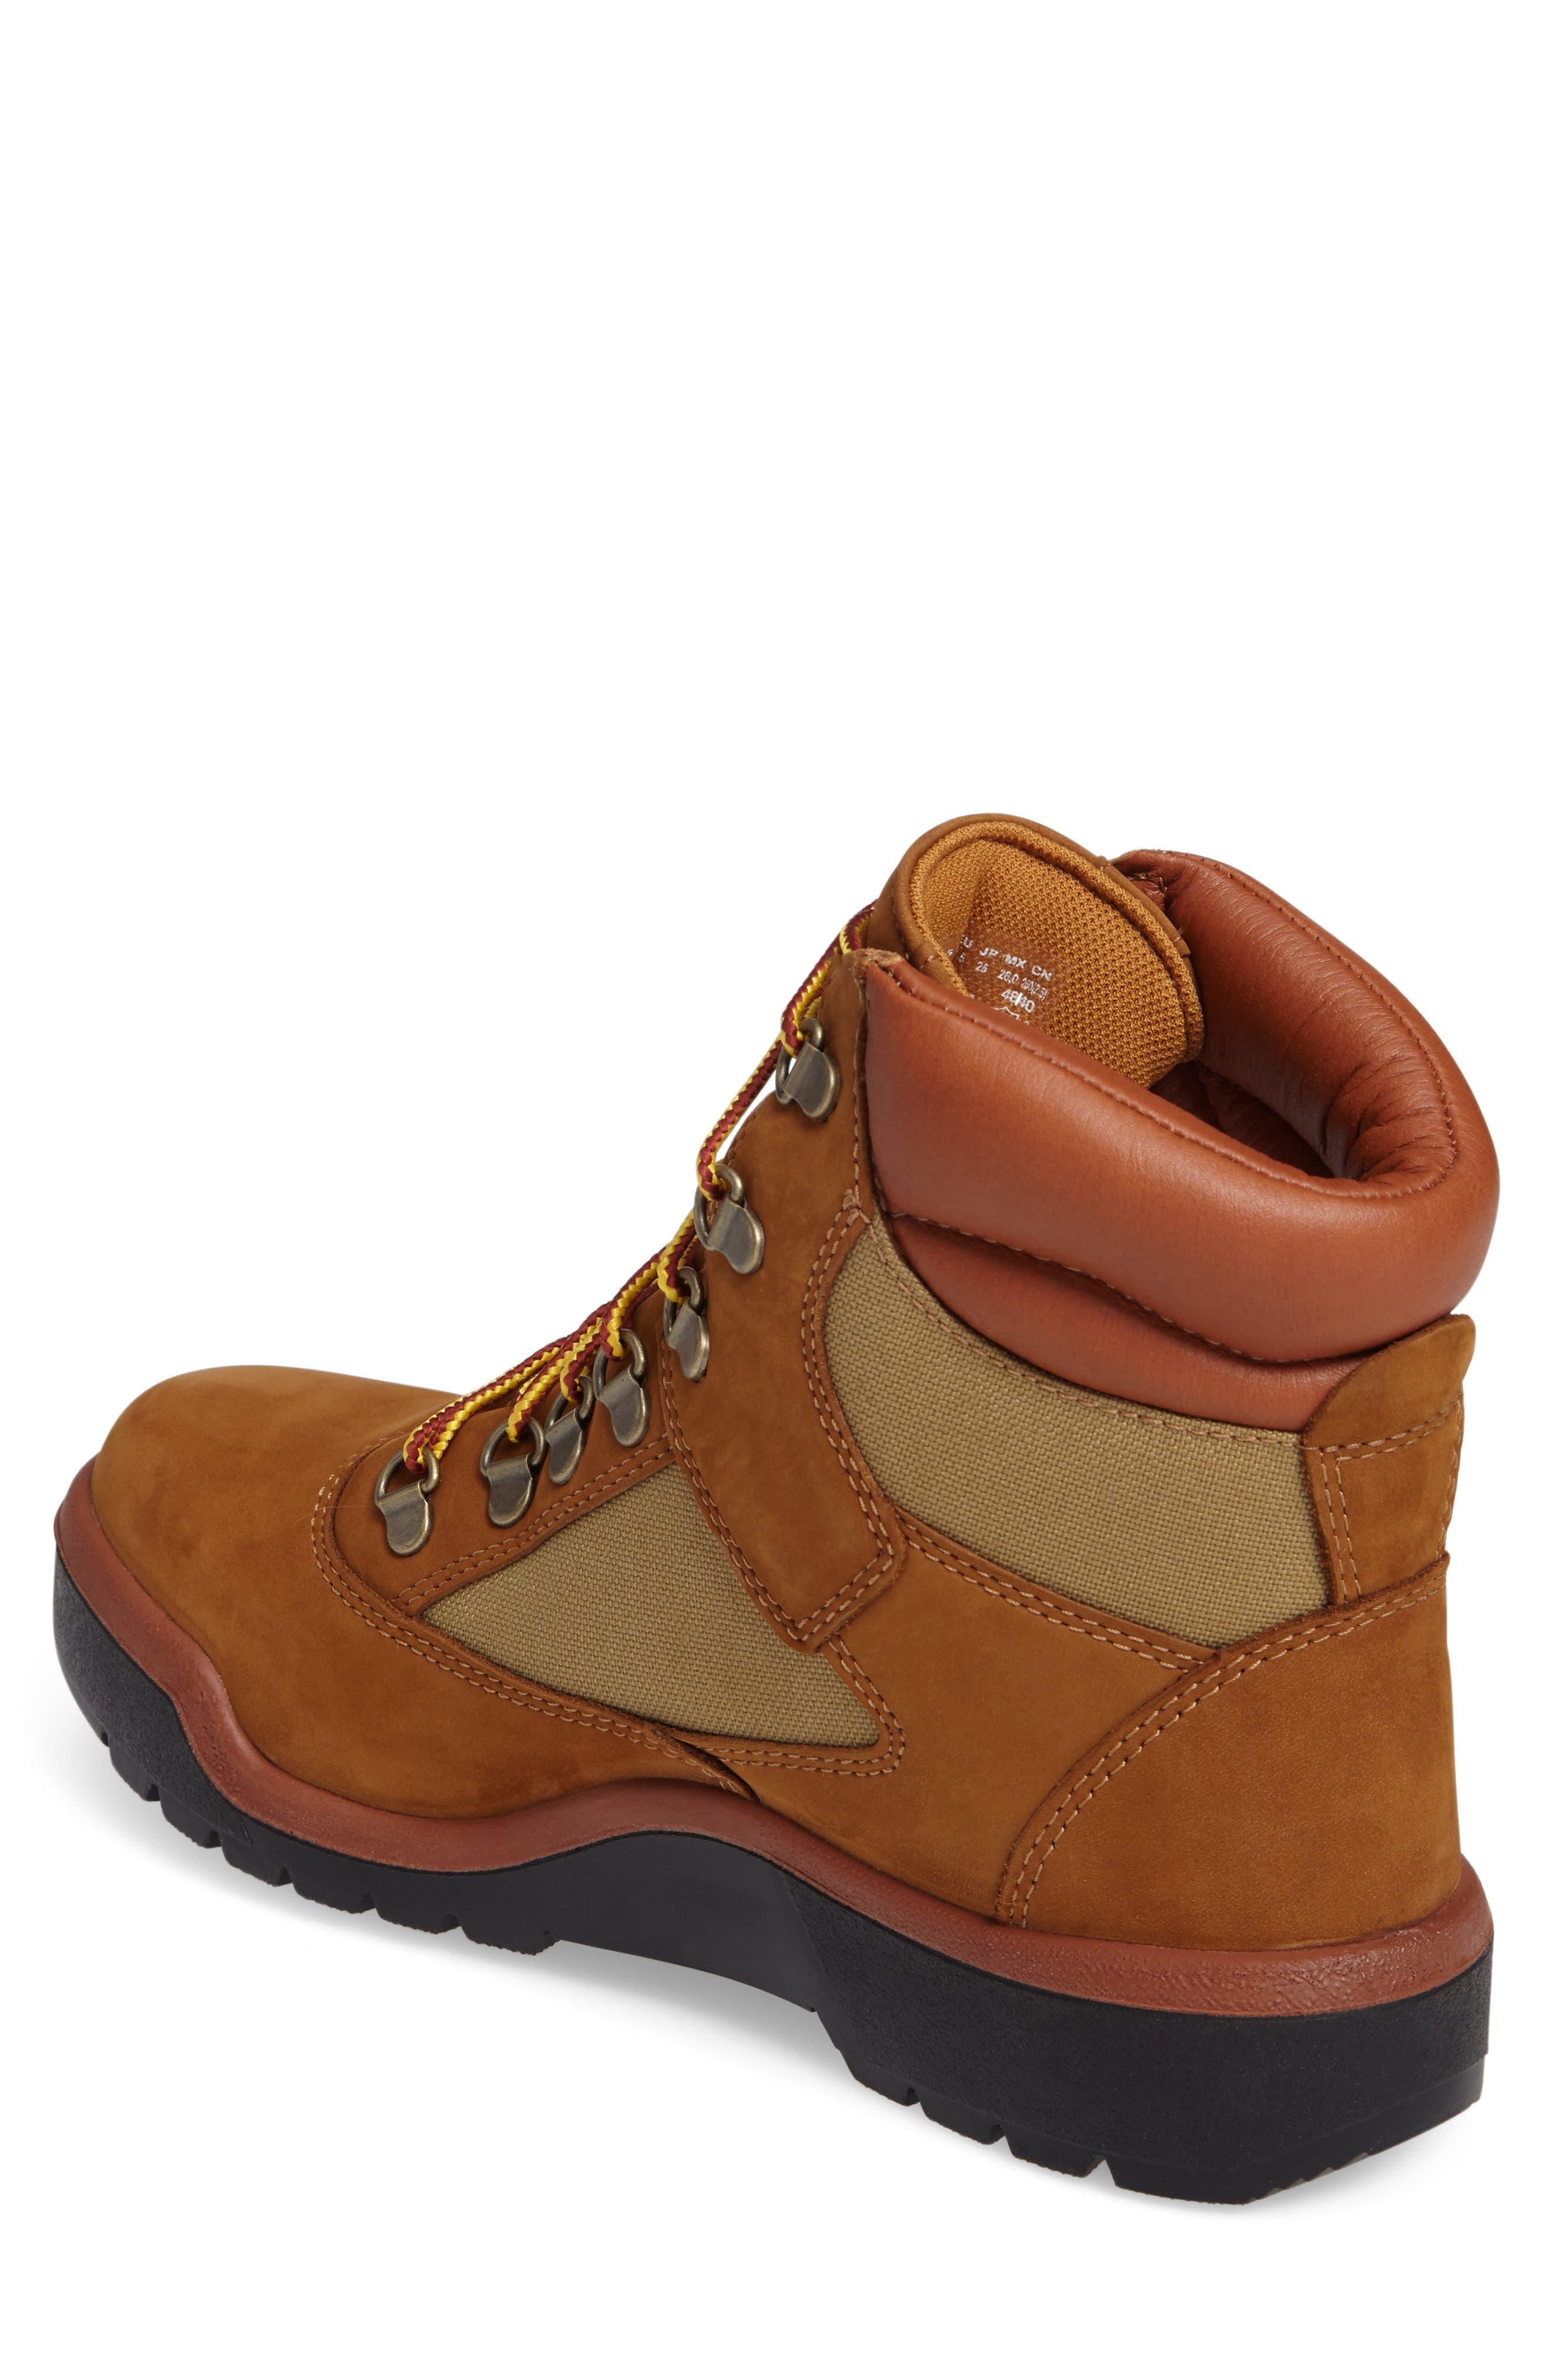 Field Waterproof Boot,                             Alternate thumbnail 17, color,